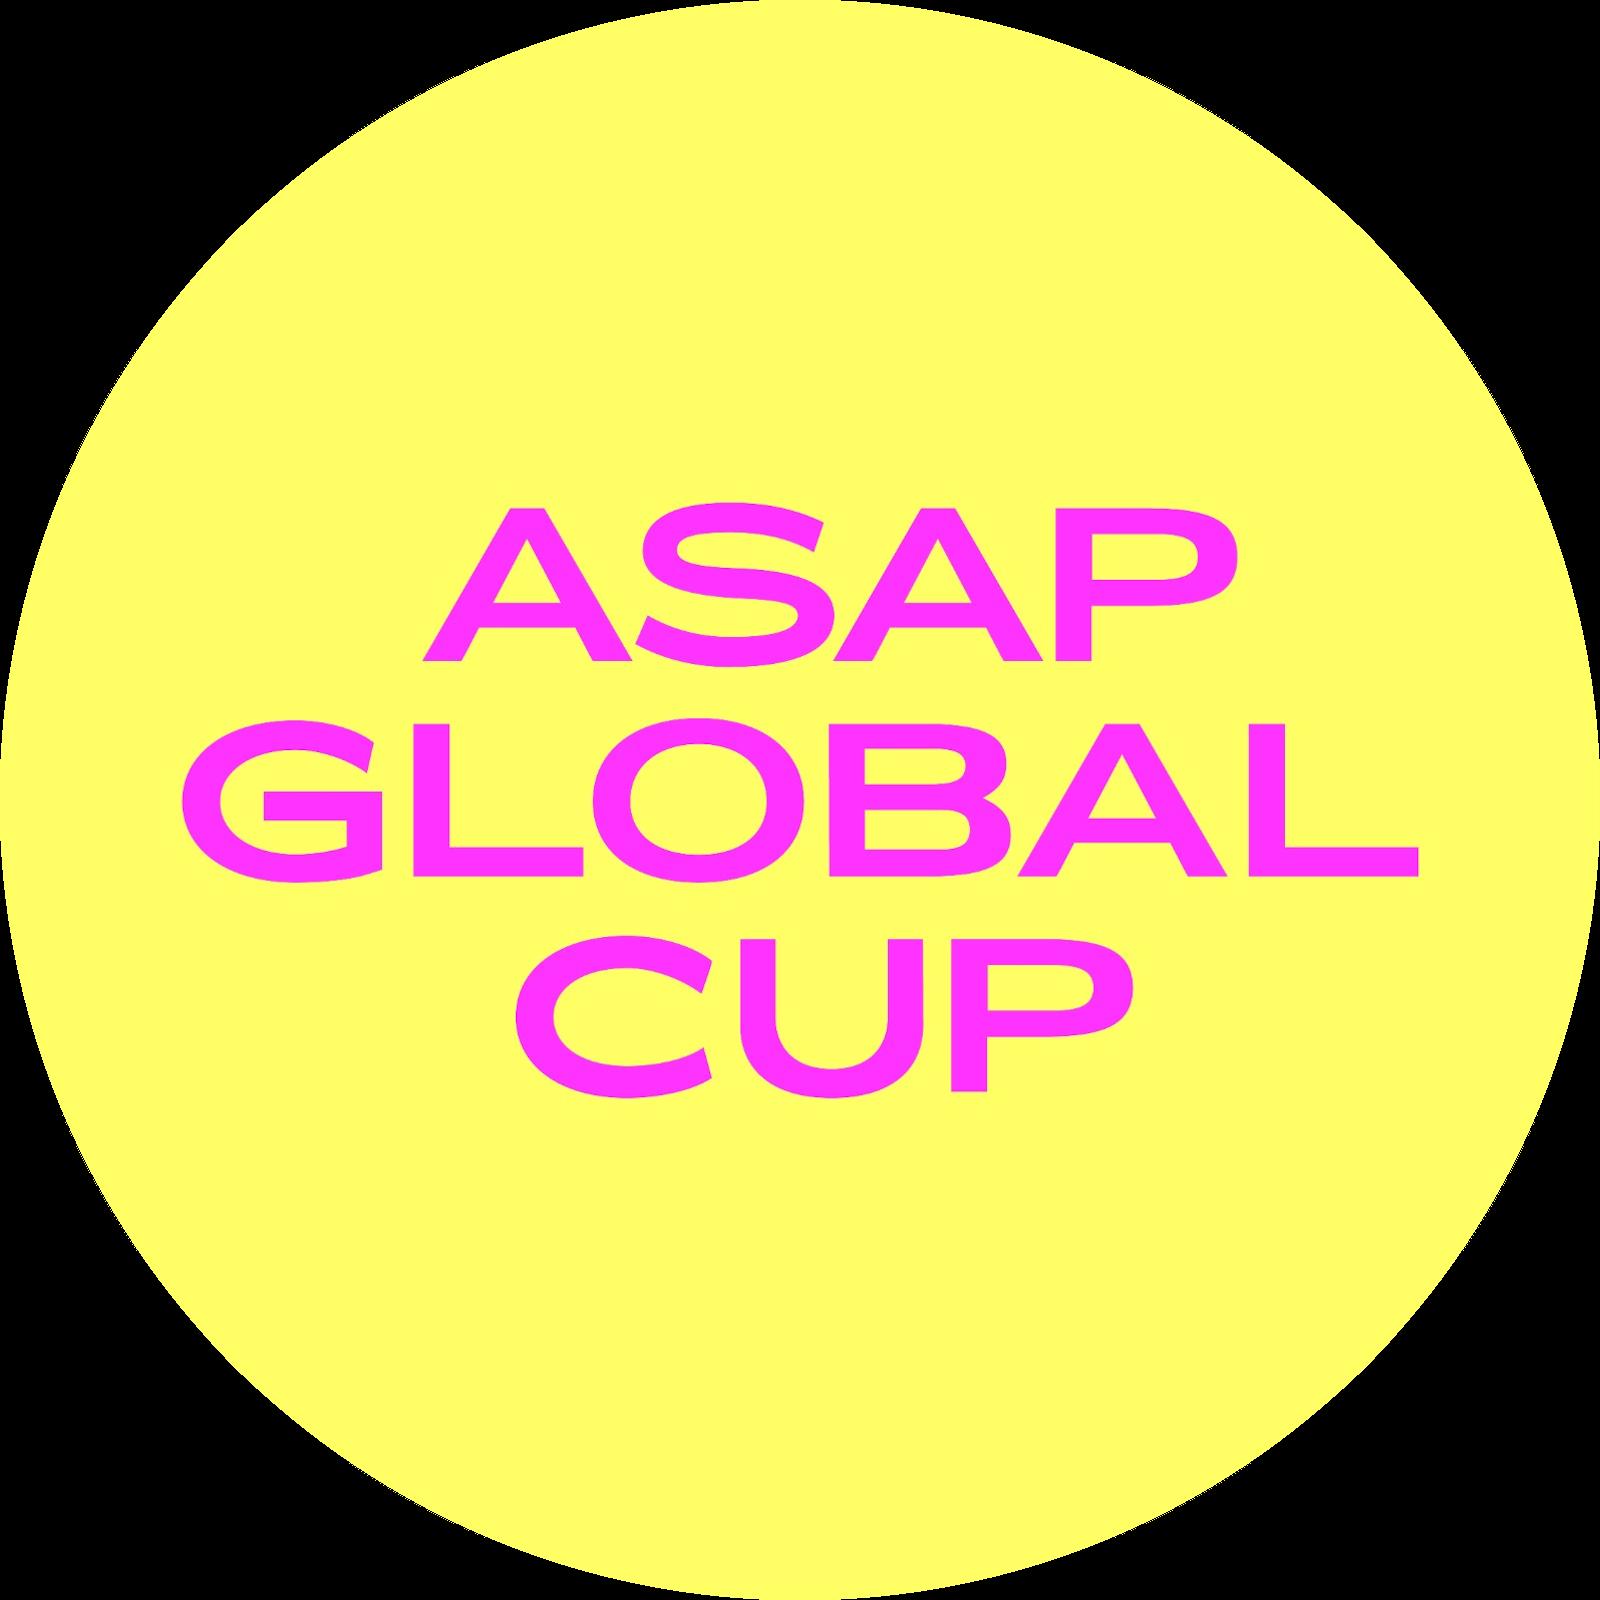 ASAP Global Cup